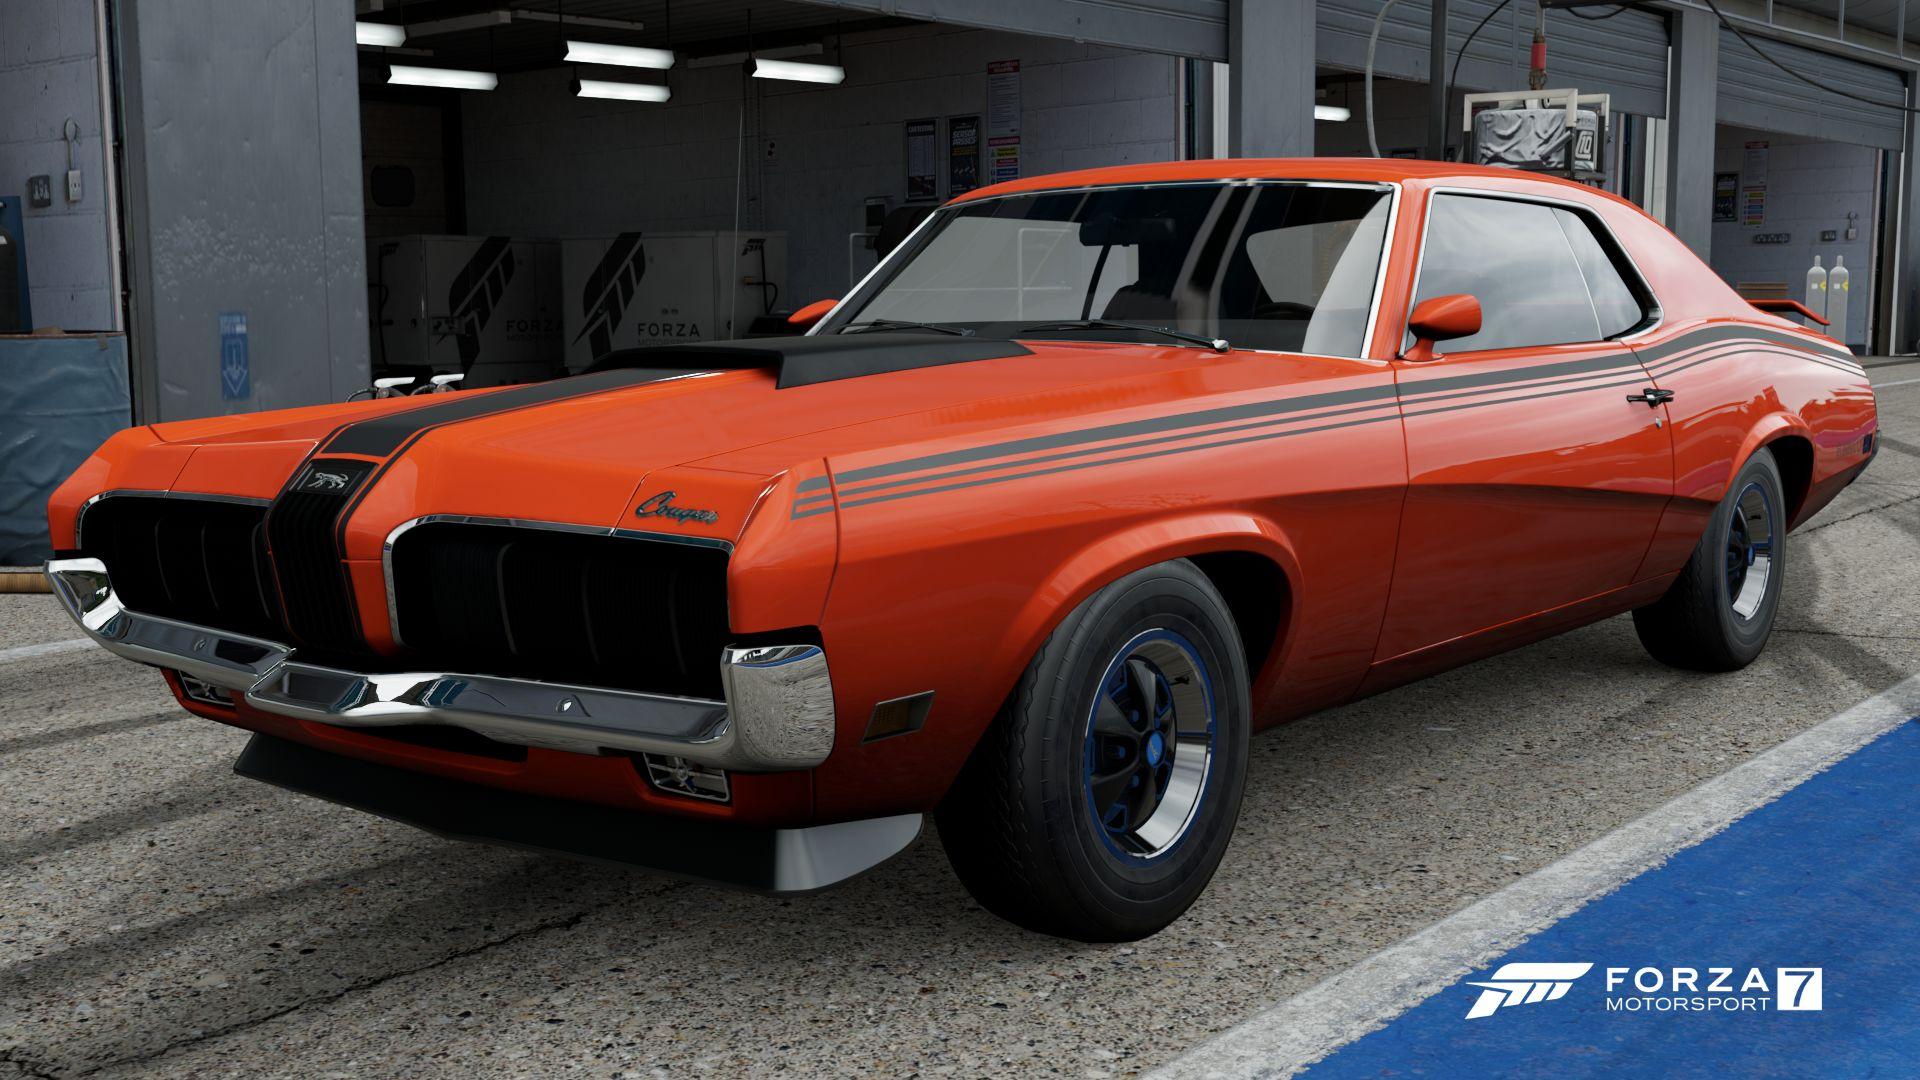 Mercury Cougar Eliminator | Forza Motorsport Wiki | FANDOM powered ...